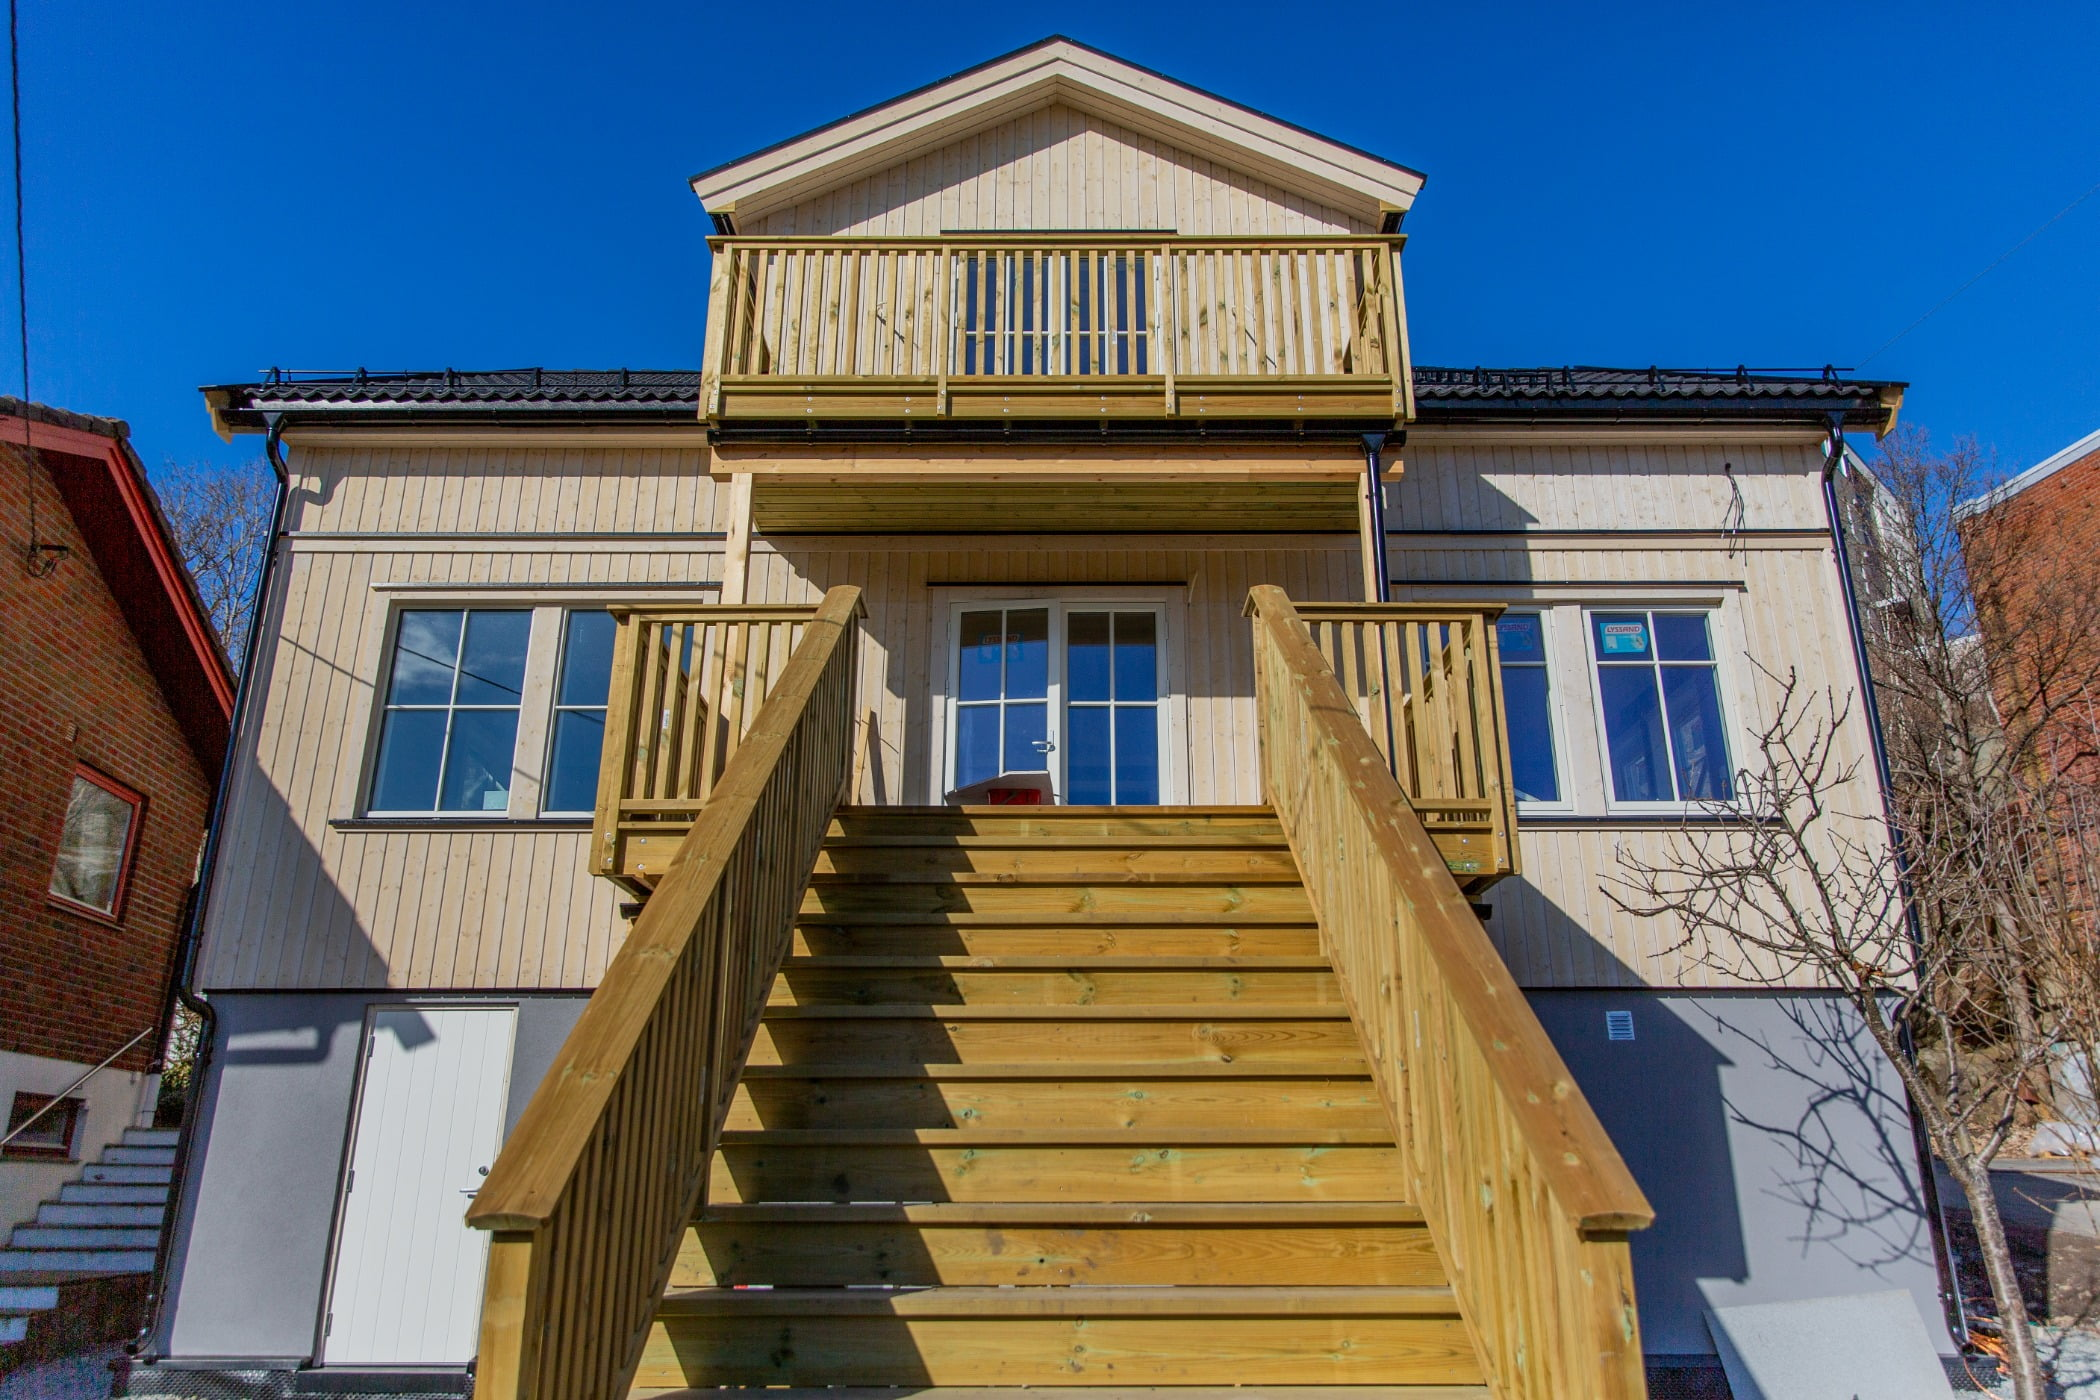 Sky, Daytime, Property, Window, Building, Fixture, Wood, House, Stairs, Neighbourhood